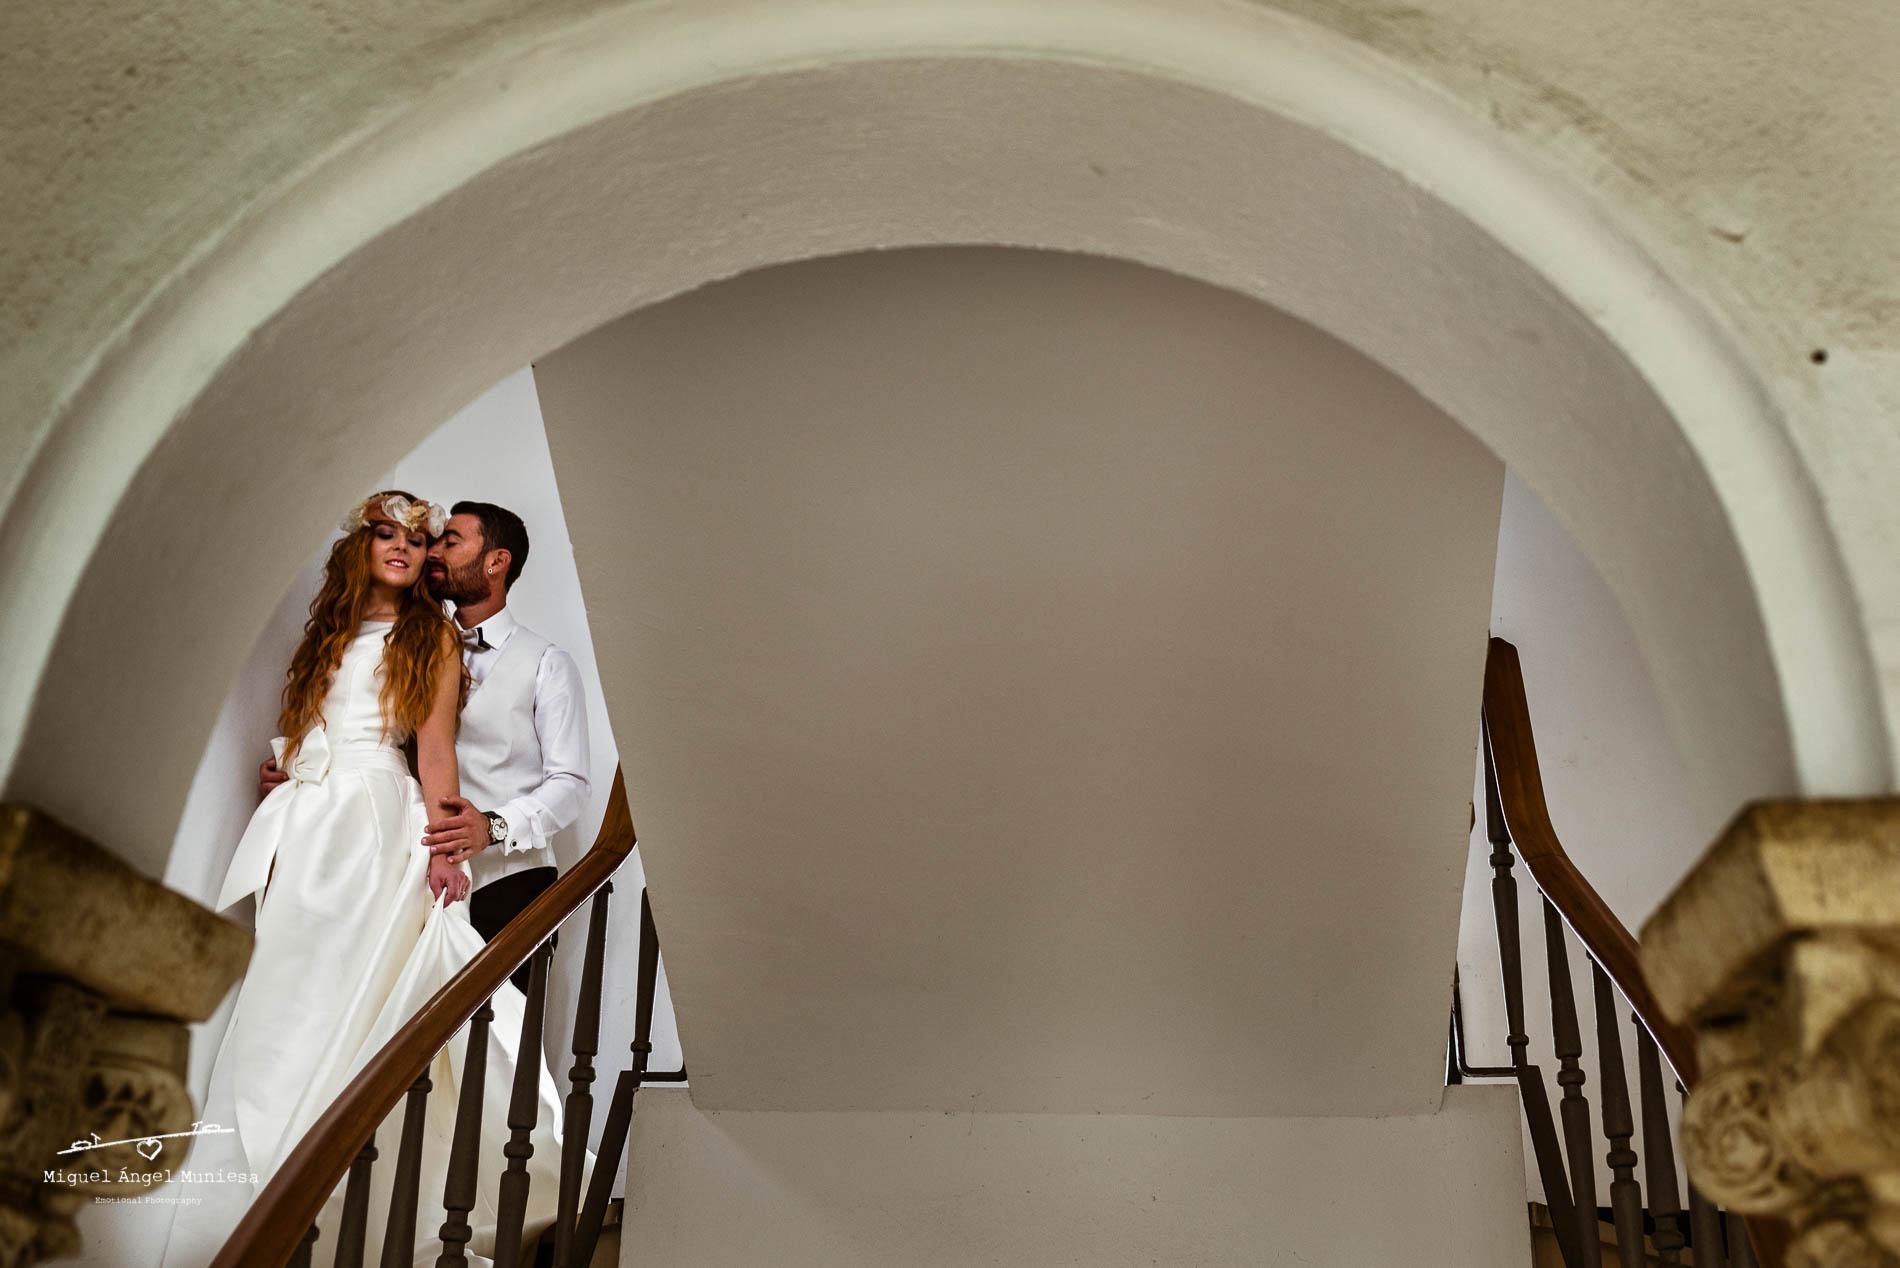 boda, fotografia de boda, boda zaragoza, fotografia, wedding, wedding photography, miguel angel muniesa, fotografo boda Zaragoza, fotografo boda, destination wedding_ 0010